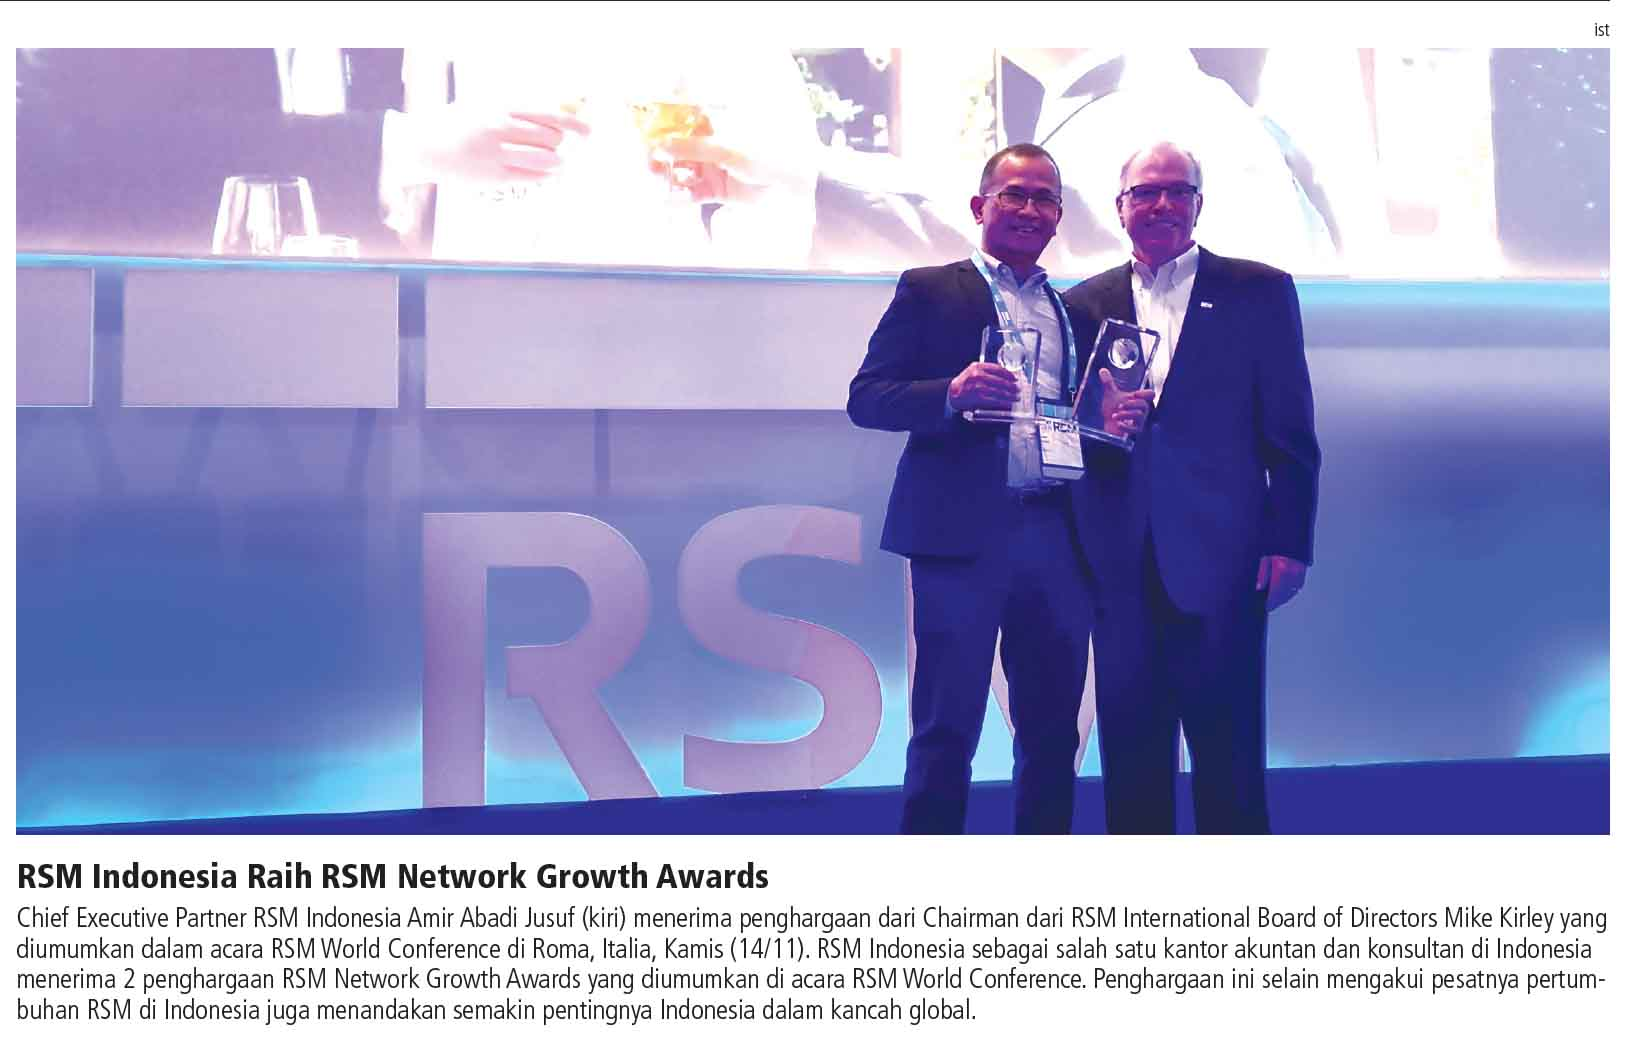 20191116-investor-daily-hal-24-berita-foto-rsm-indonesia-raih-rsm-network-growth-awards.jpg